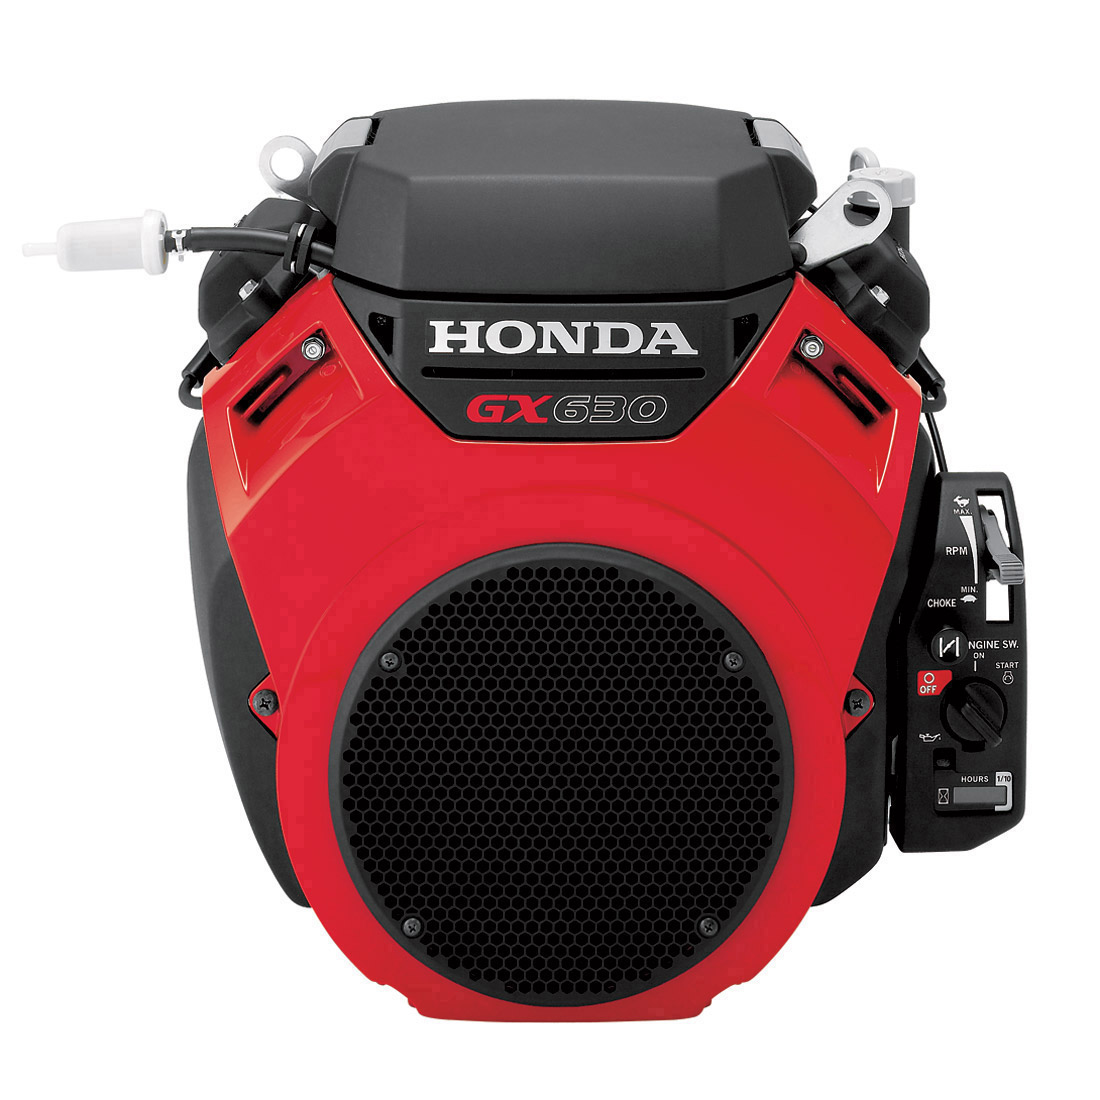 honda gx630 gator generators rh gatorgenerator com Honda ATV Wiring Diagram Honda Civic Wiring Harness Diagram